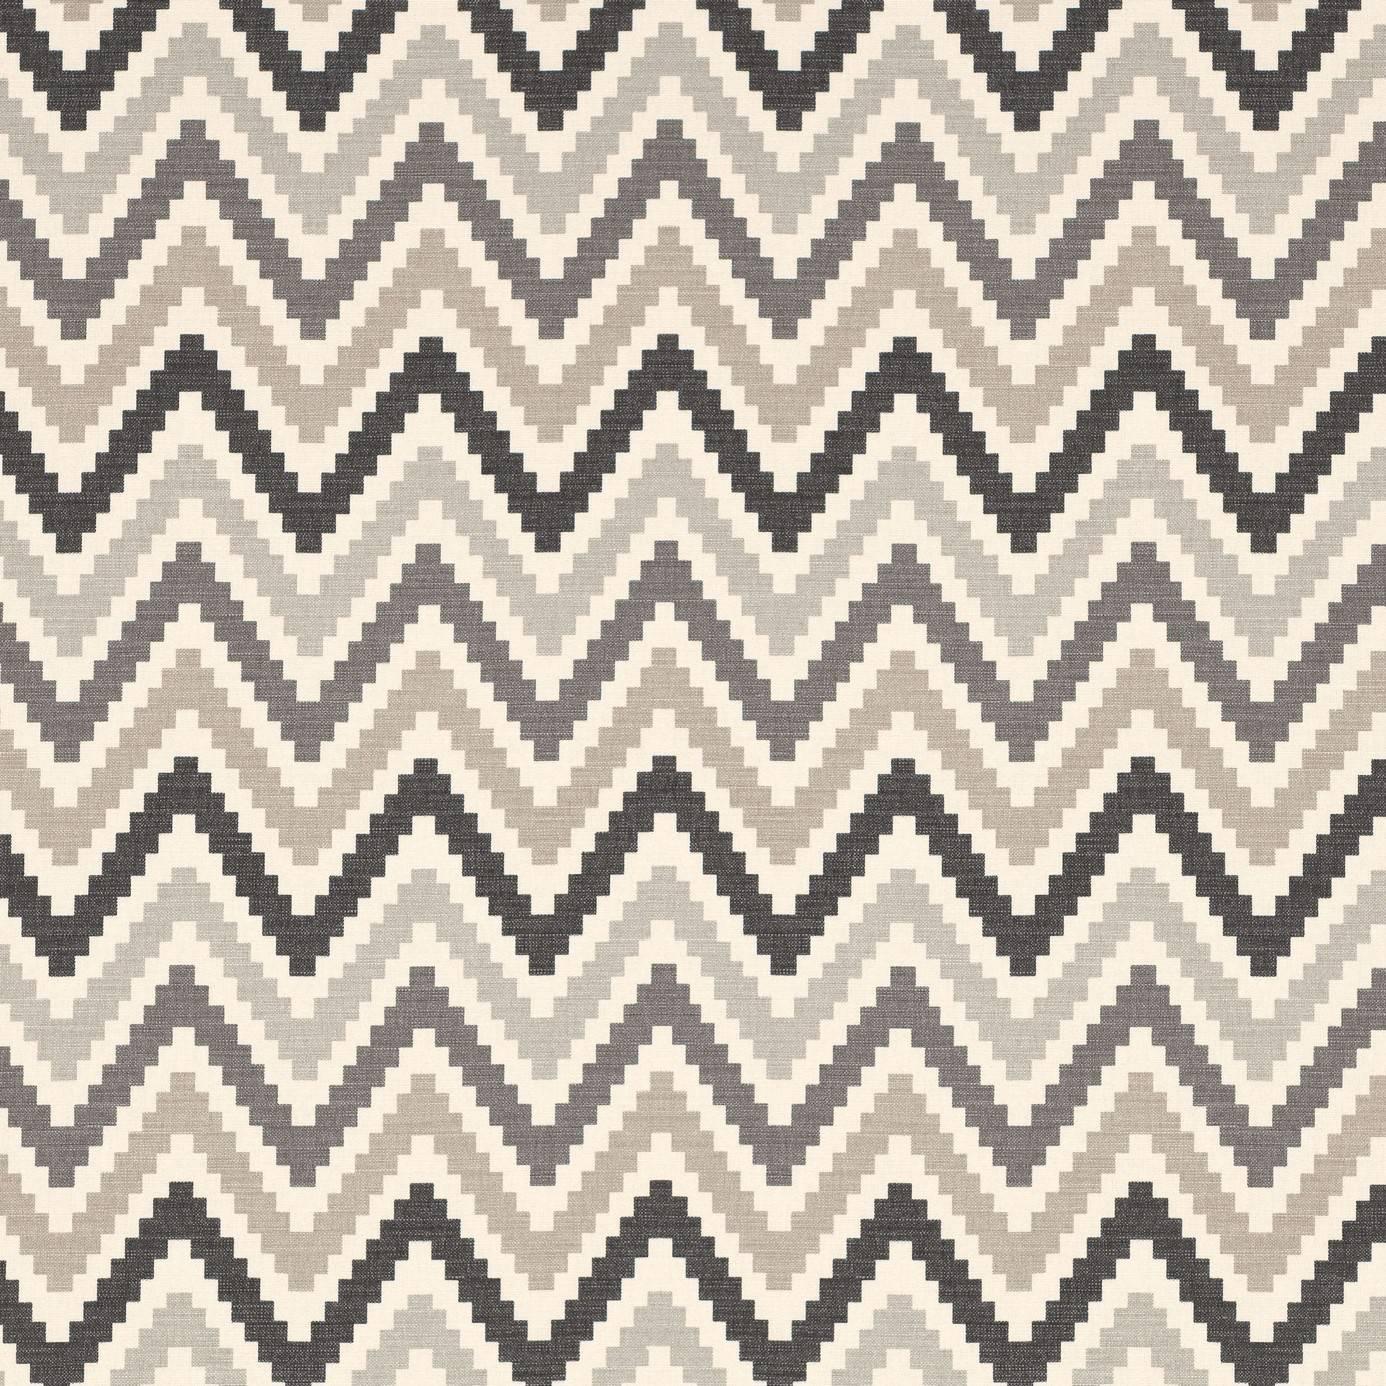 Scala Fabric Charcoal 7742 03 Romo Cubis Fabrics